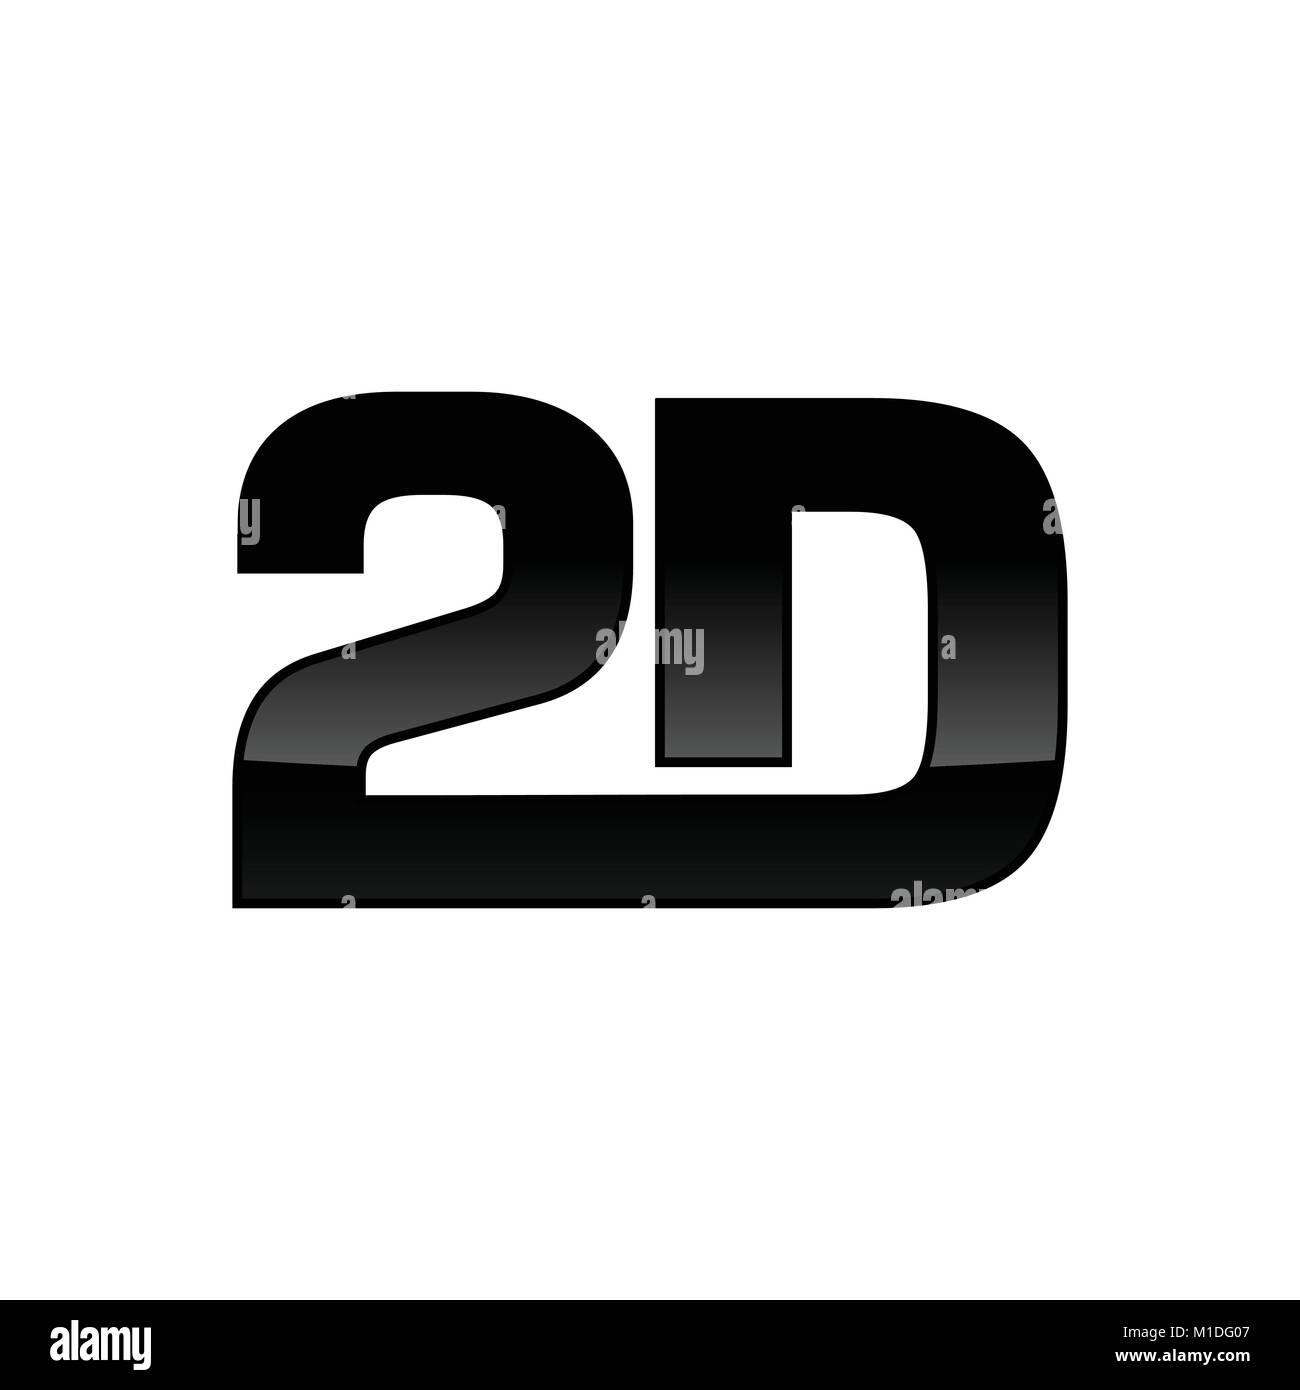 Isolated 2D Custom Logotype Vector Graphic Design - Stock Image